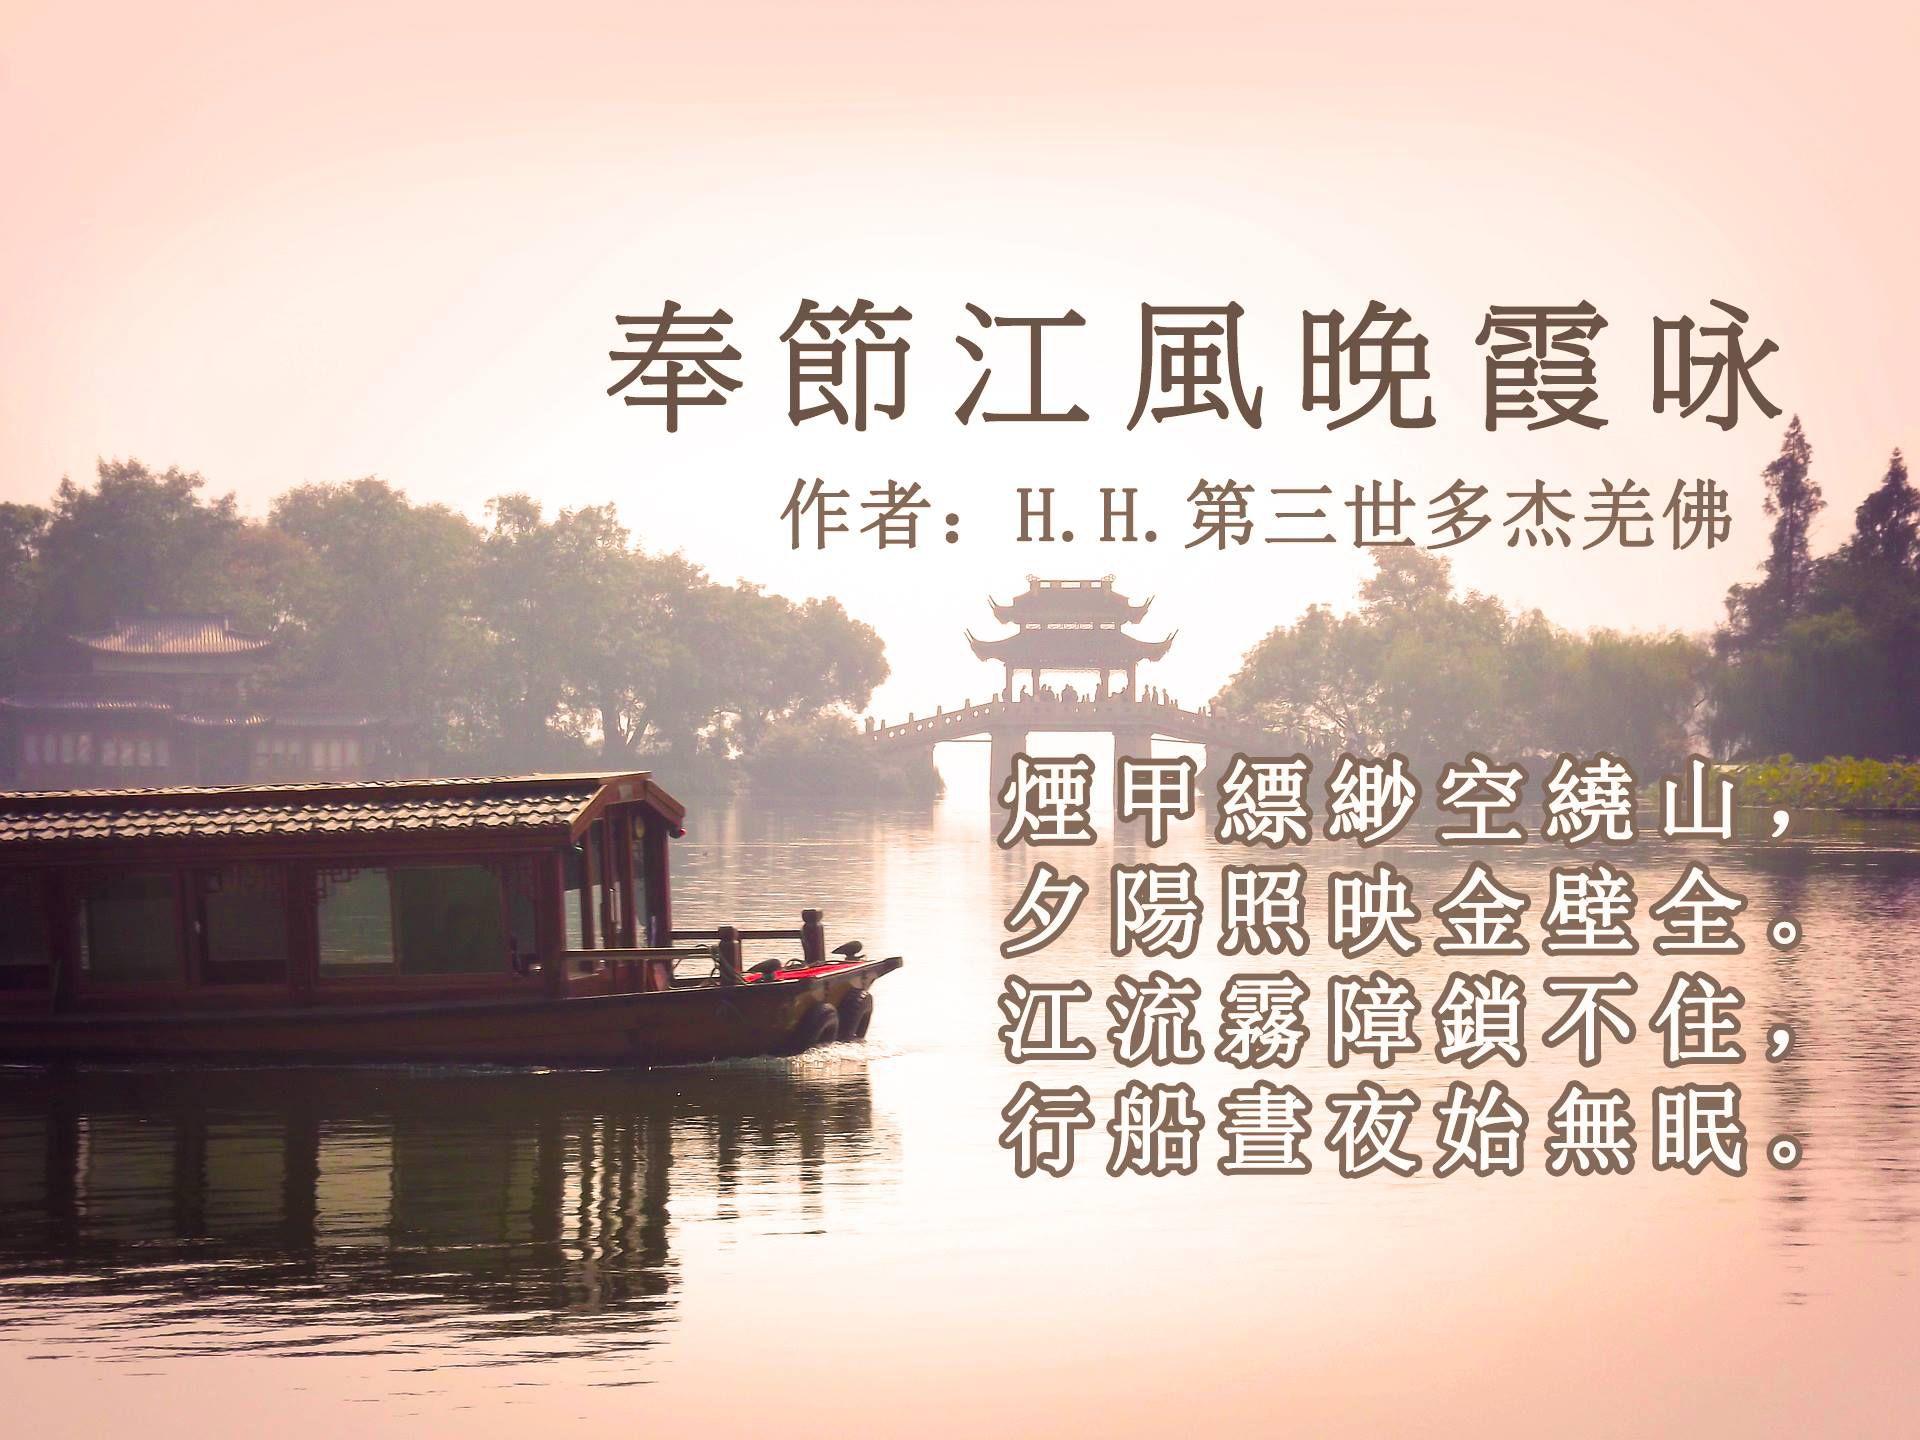 H.H.第三世多杰羌佛詩詞歌賦作品:奉節江風晚霞咏